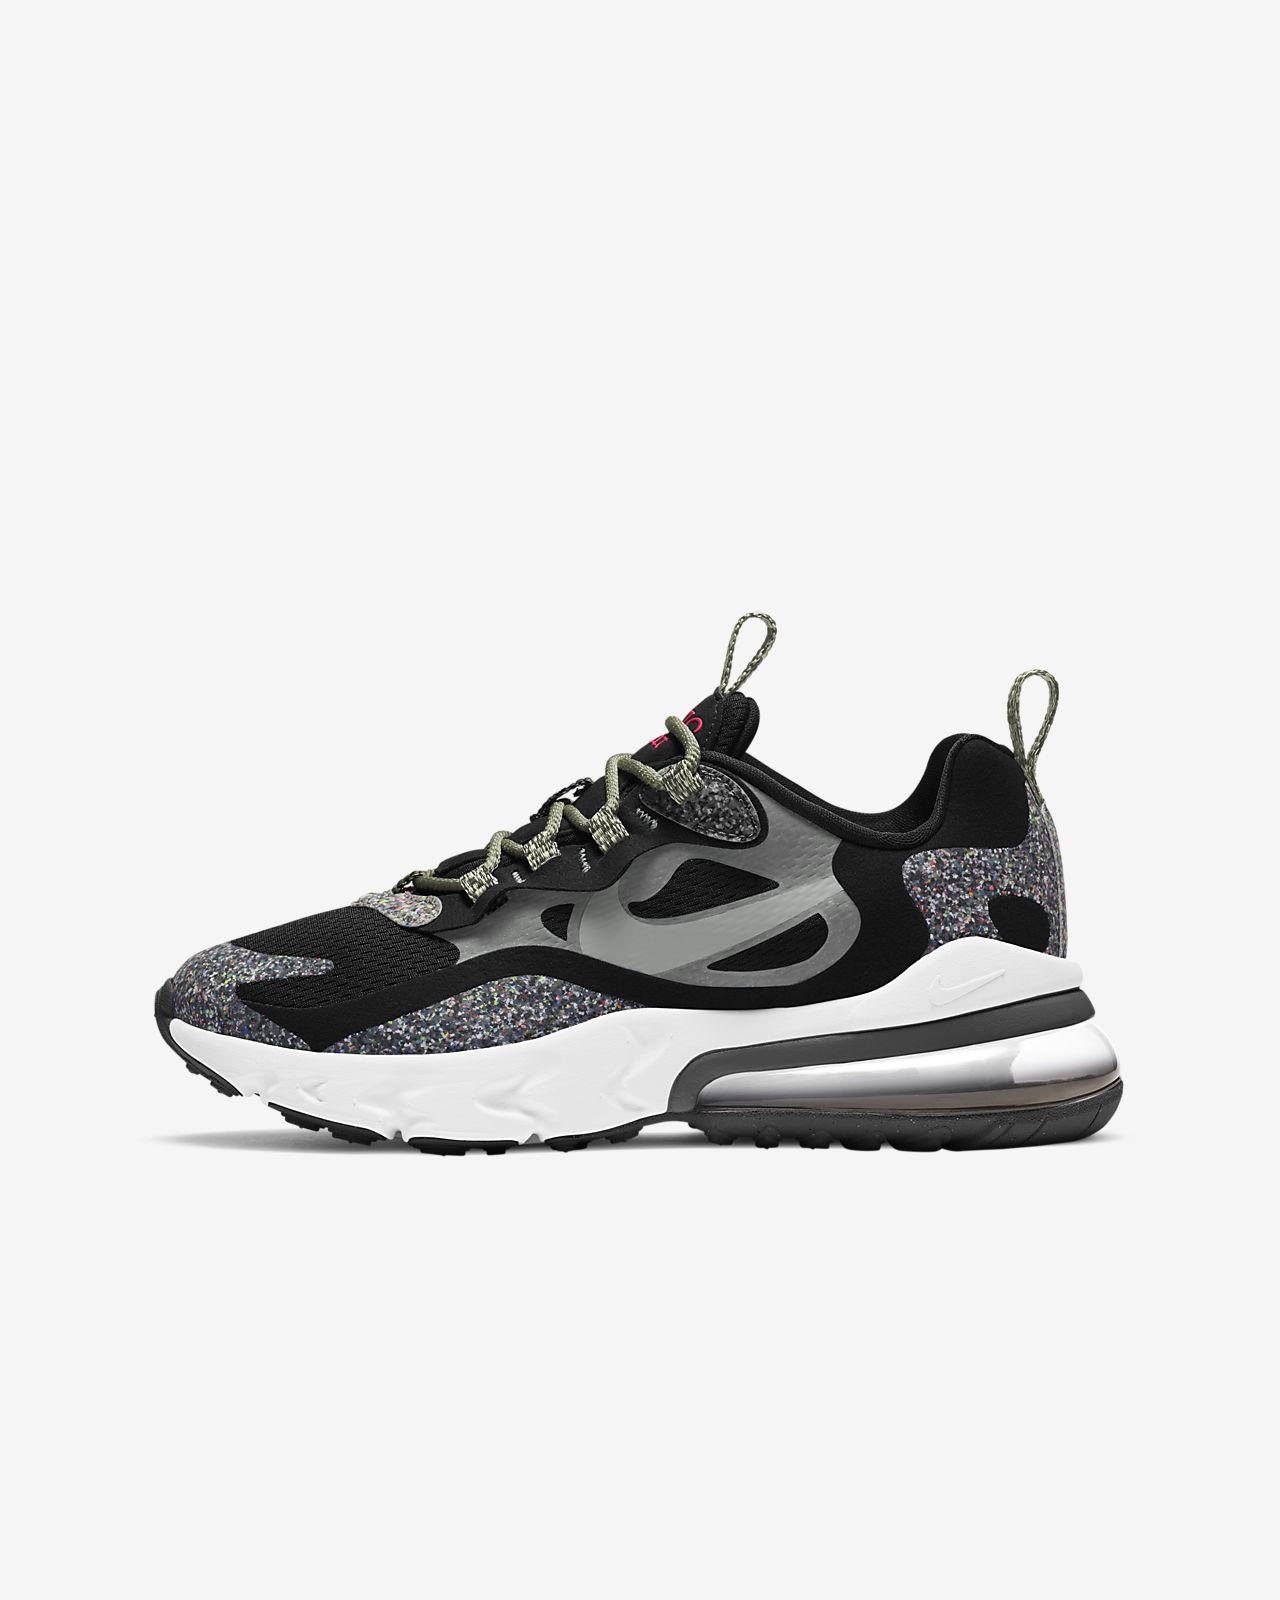 Nike Air Max 270 React SE Kinderschoen